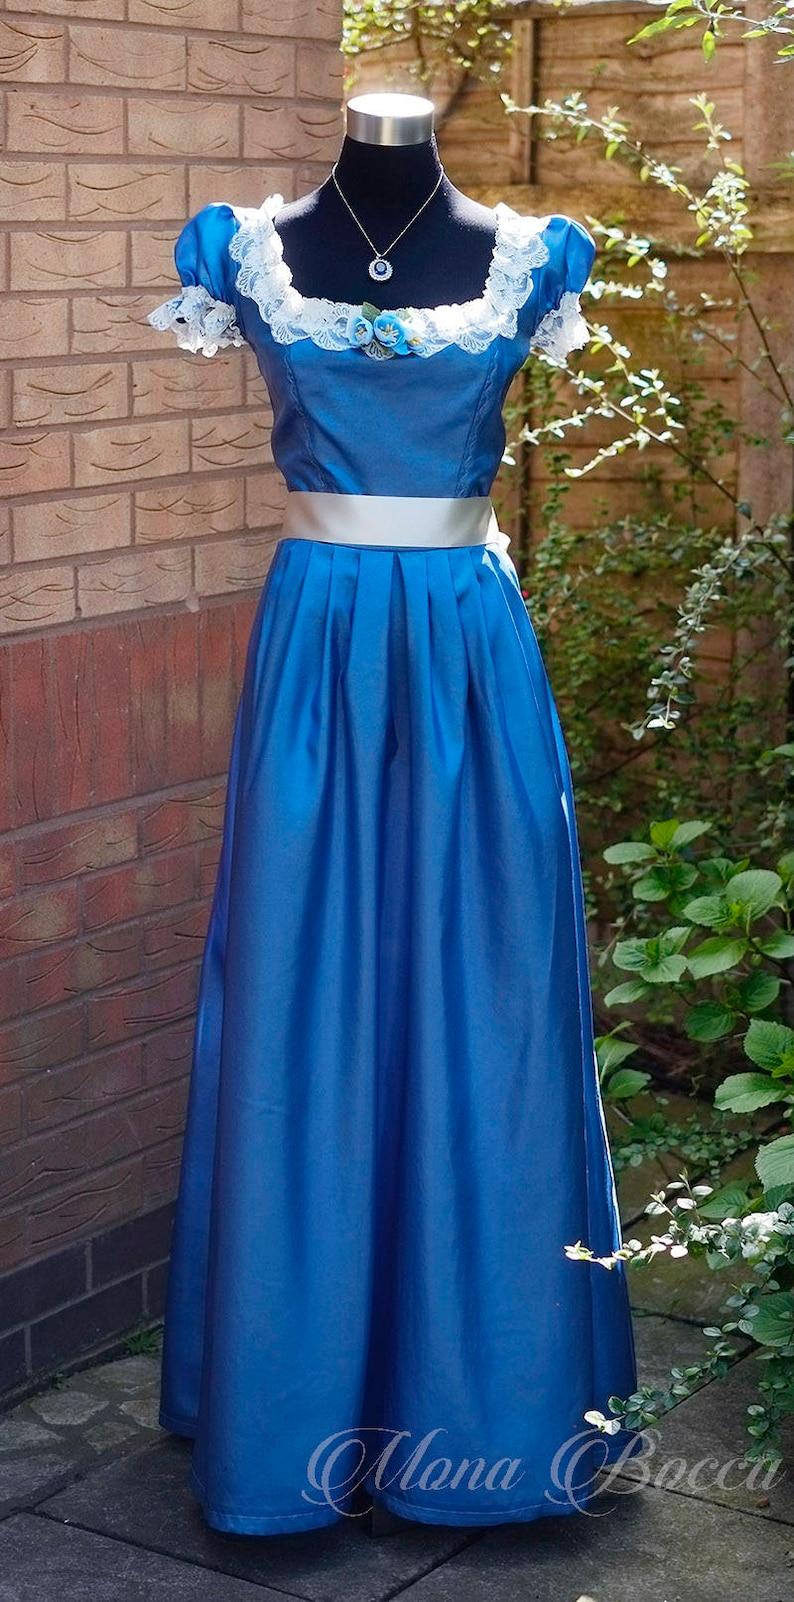 Victorian Dresses | Victorian Ballgowns | Victorian Clothing     Blue young Victoria soiree dress Disney Princess Snow White dress Fae dress Maiden dress Victorian dress Edwardian dress $254.52 AT vintagedancer.com